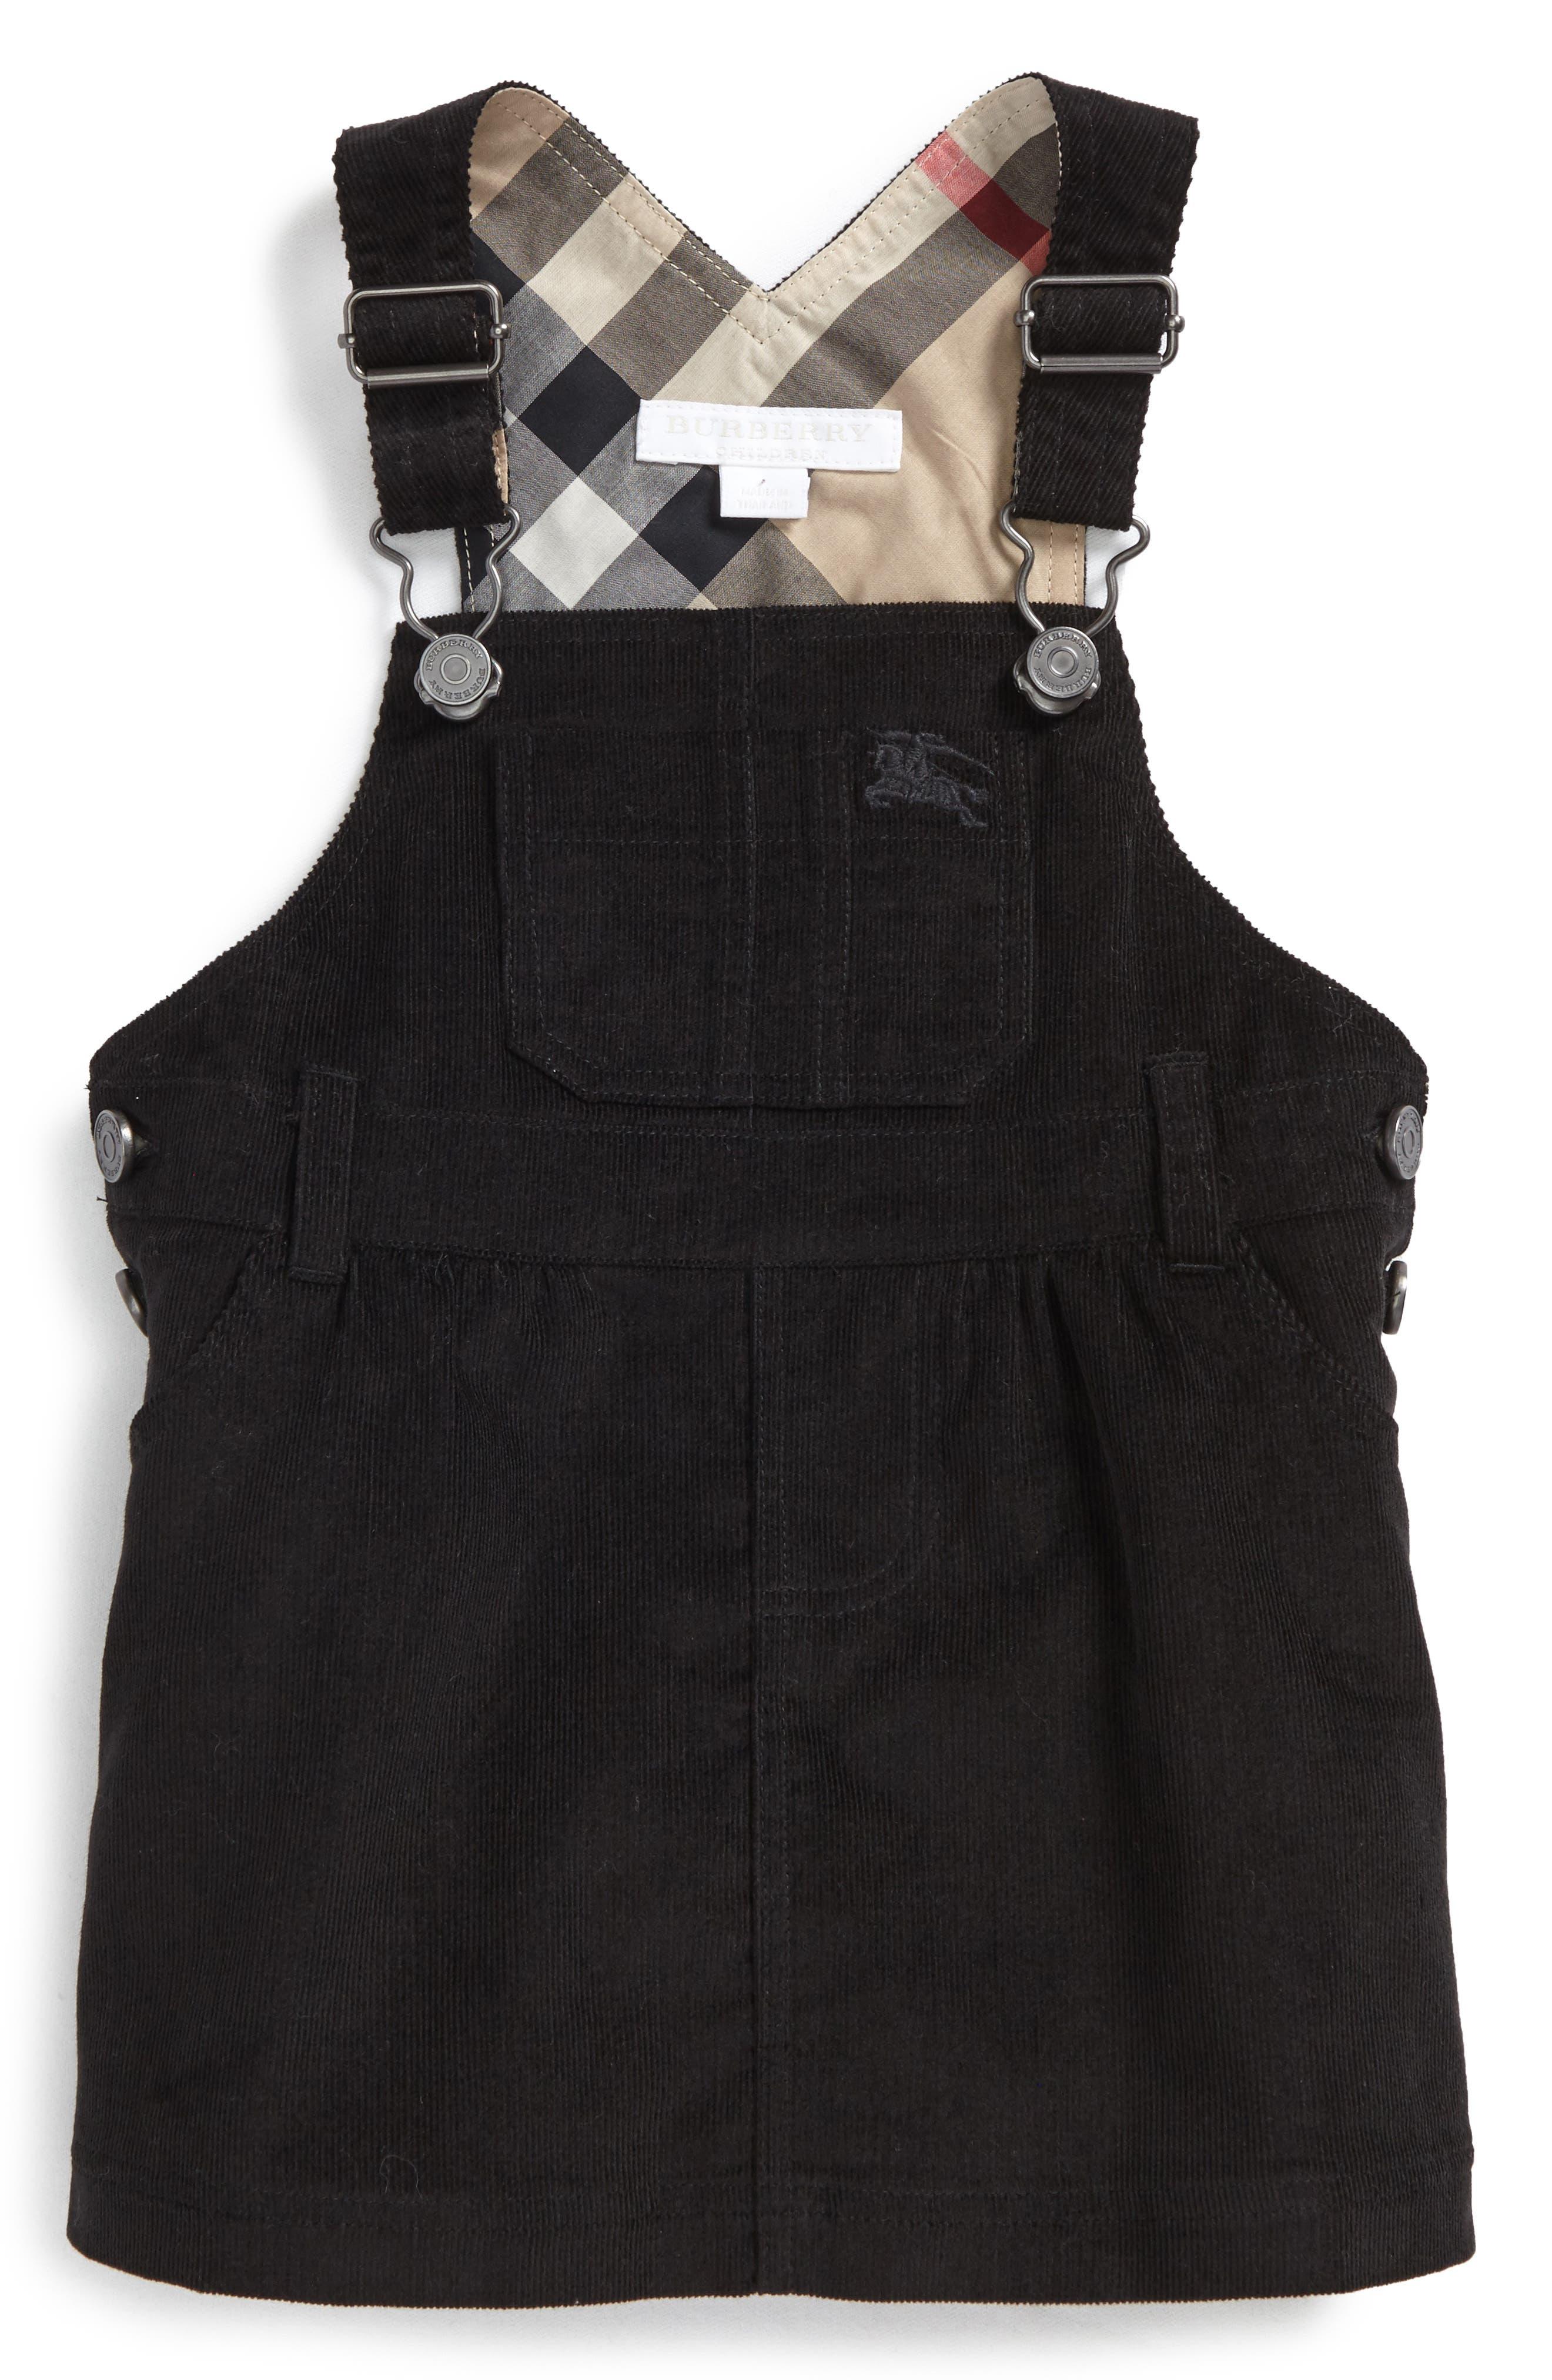 Main Image - Burberry Wilma Overalls Dress (Baby Girl)